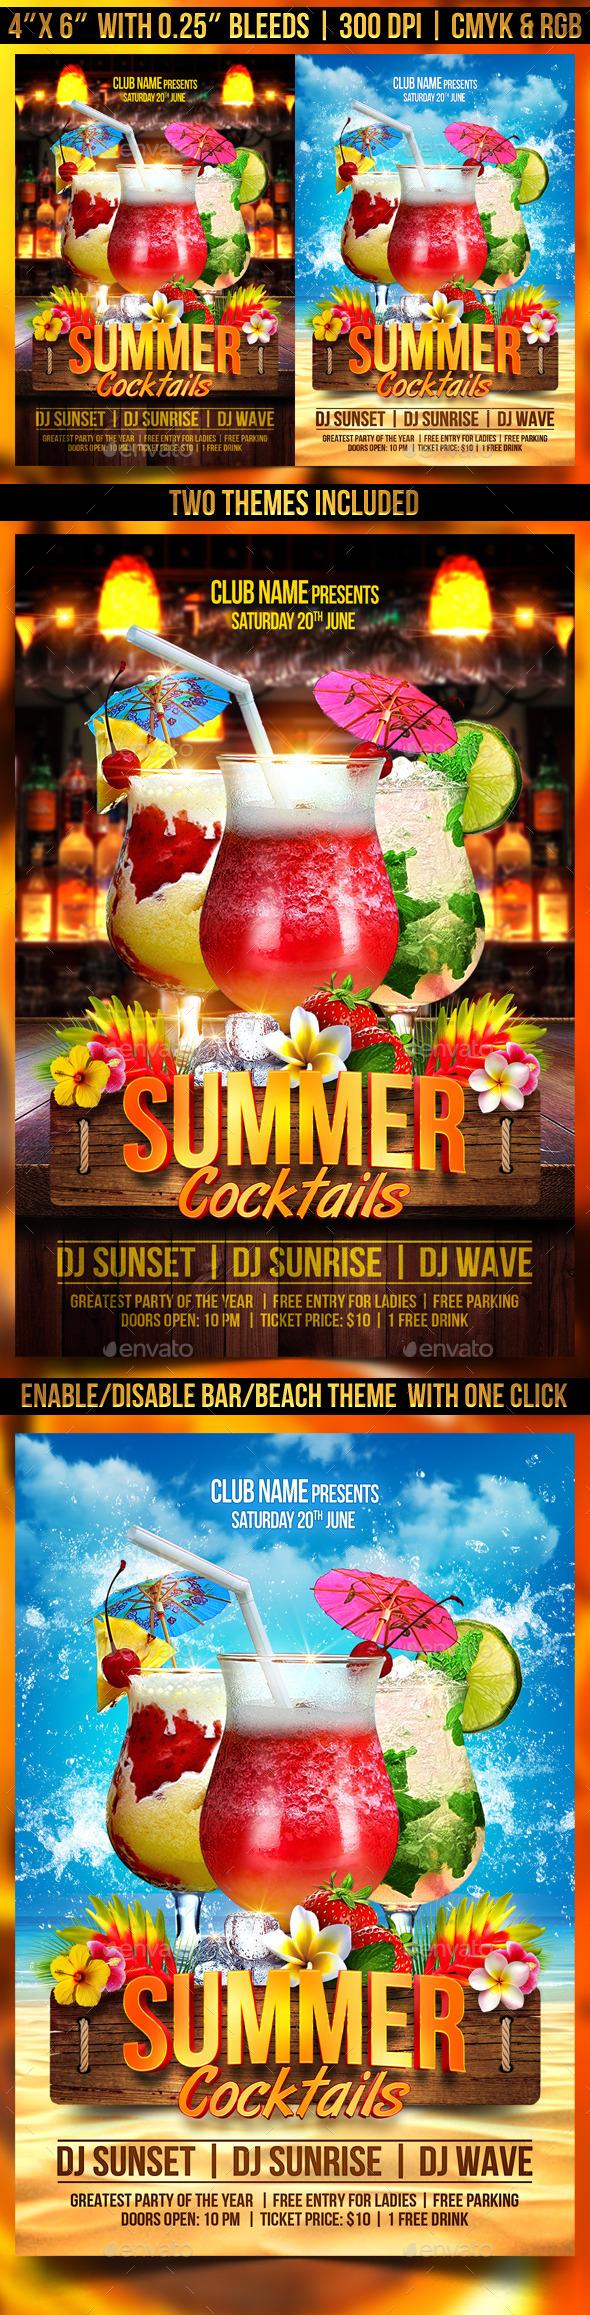 Summer Cocktails Flyer Template